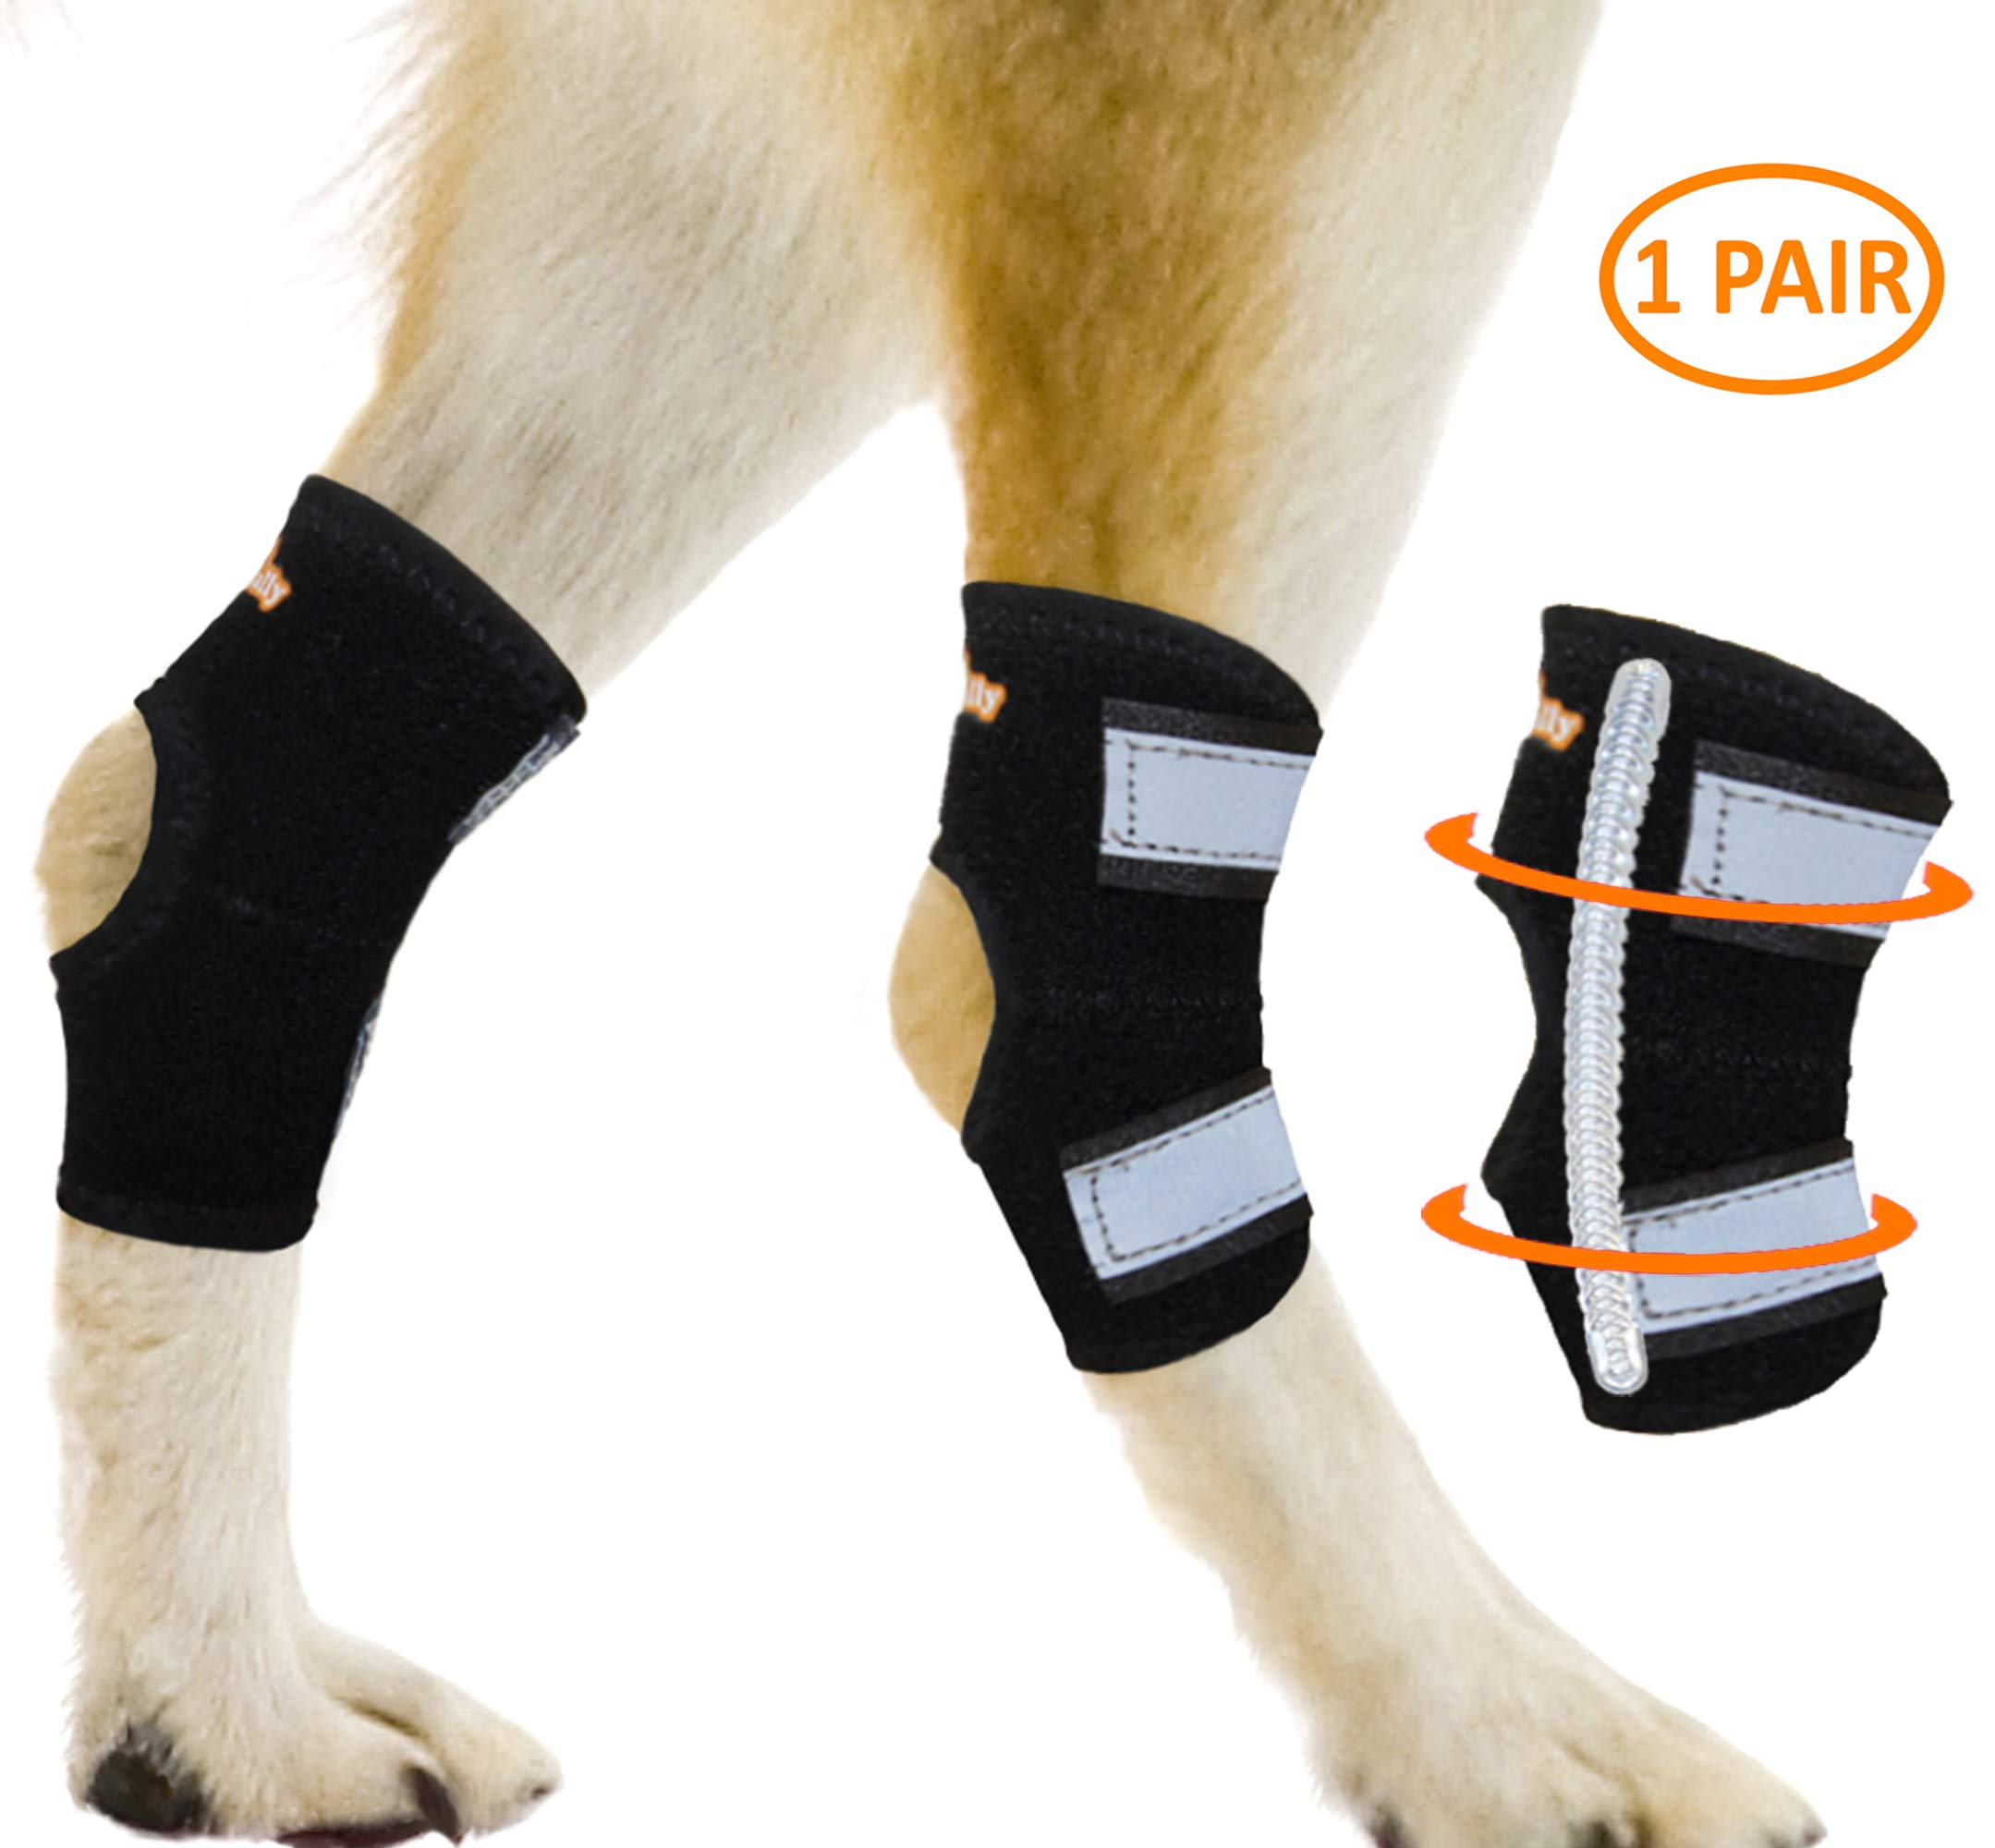 Abrazadera,patas traseras esguinces,artritis-Extra grande